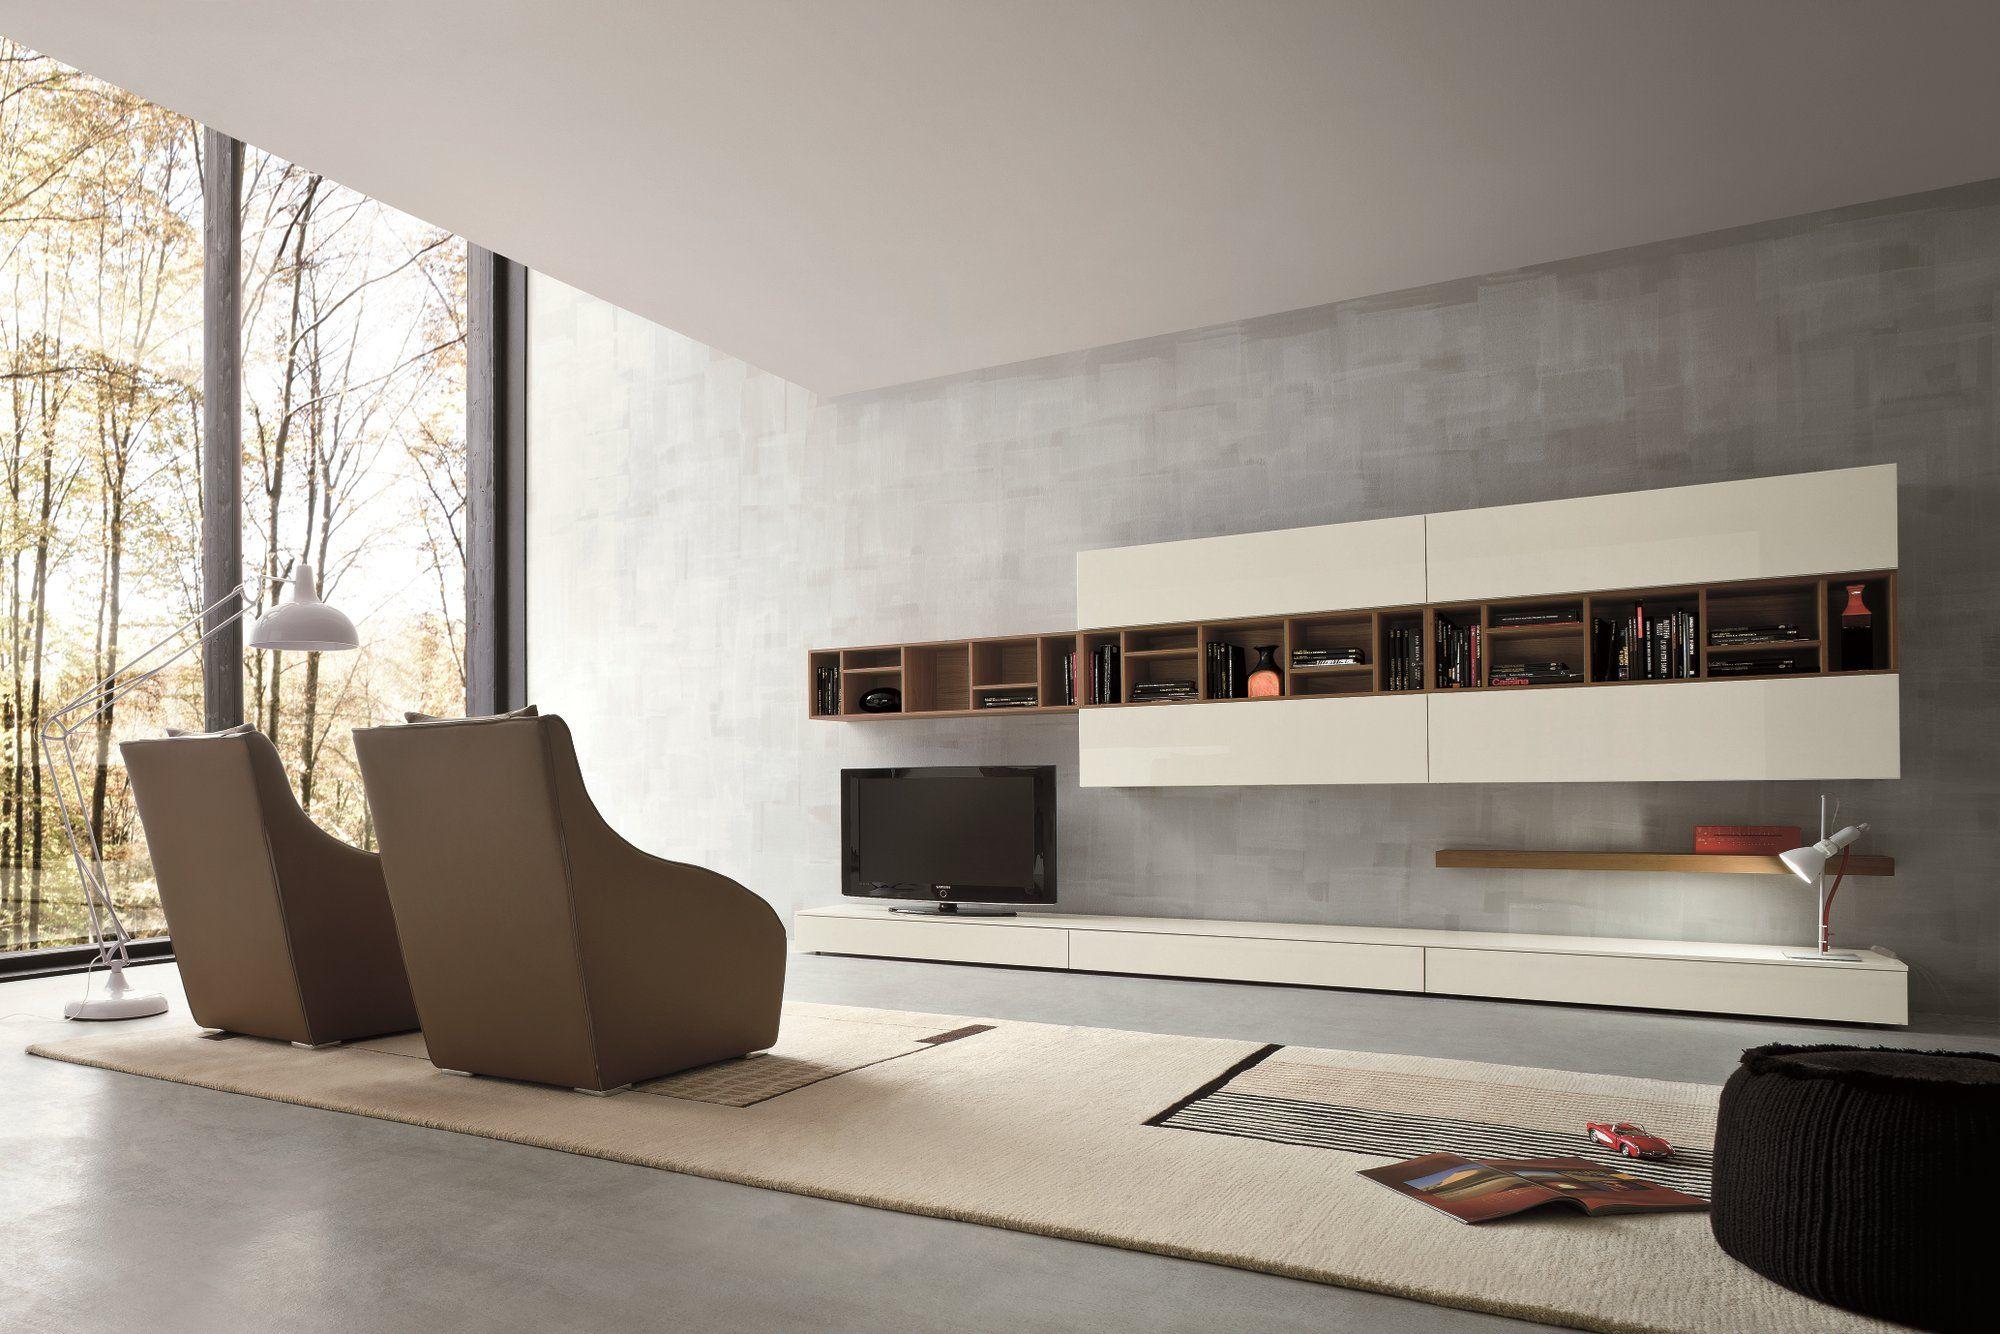 Wohnwand italian design  Anbau- TV- Wohnwand SLIM 16 By Dall'Agnese Design Imago Design